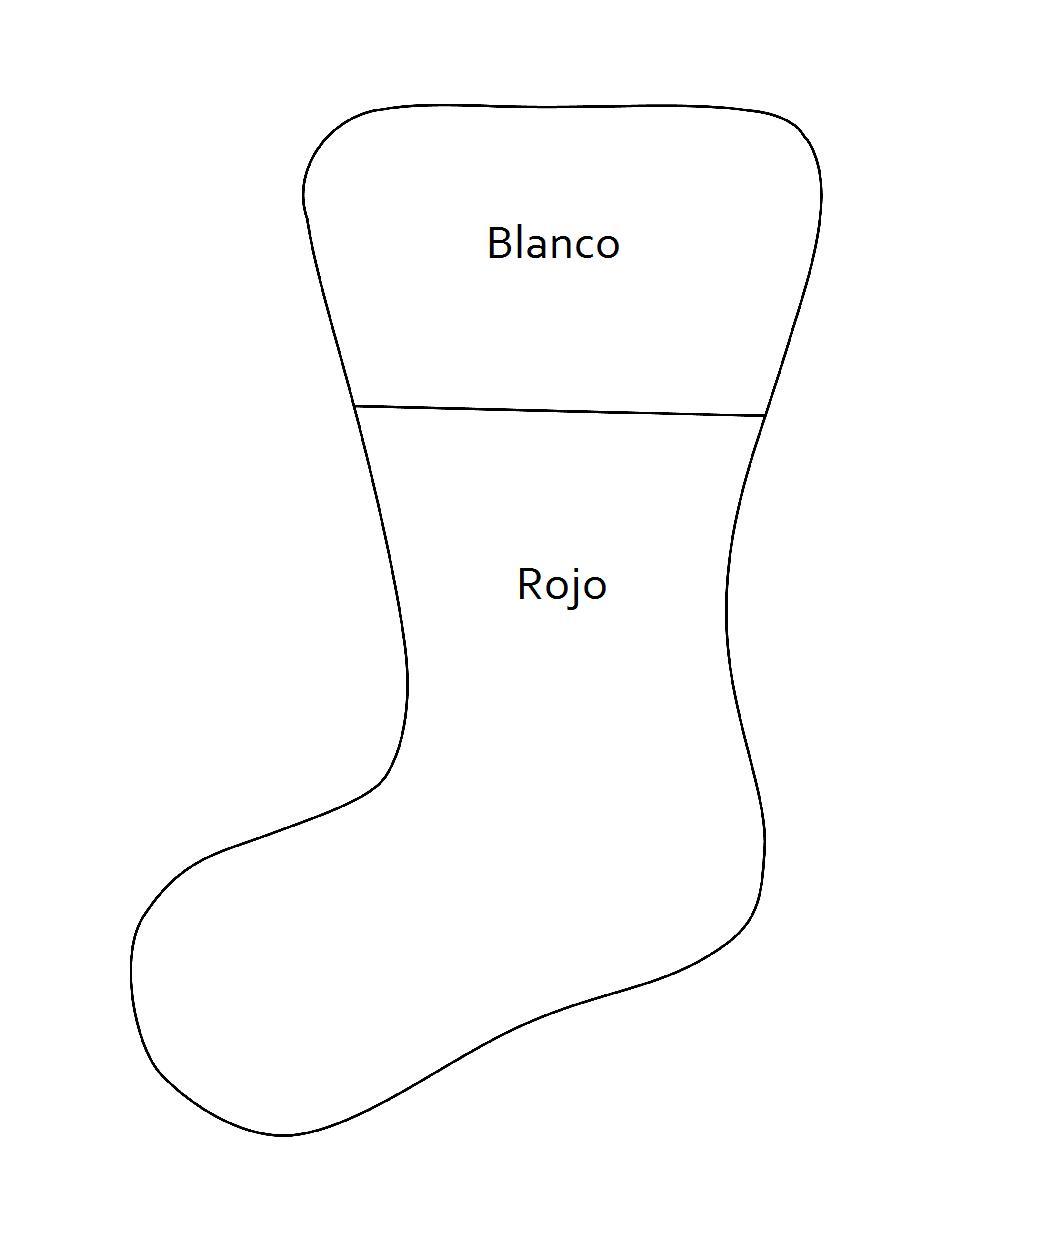 Moldes de botas navideñas para imprimir